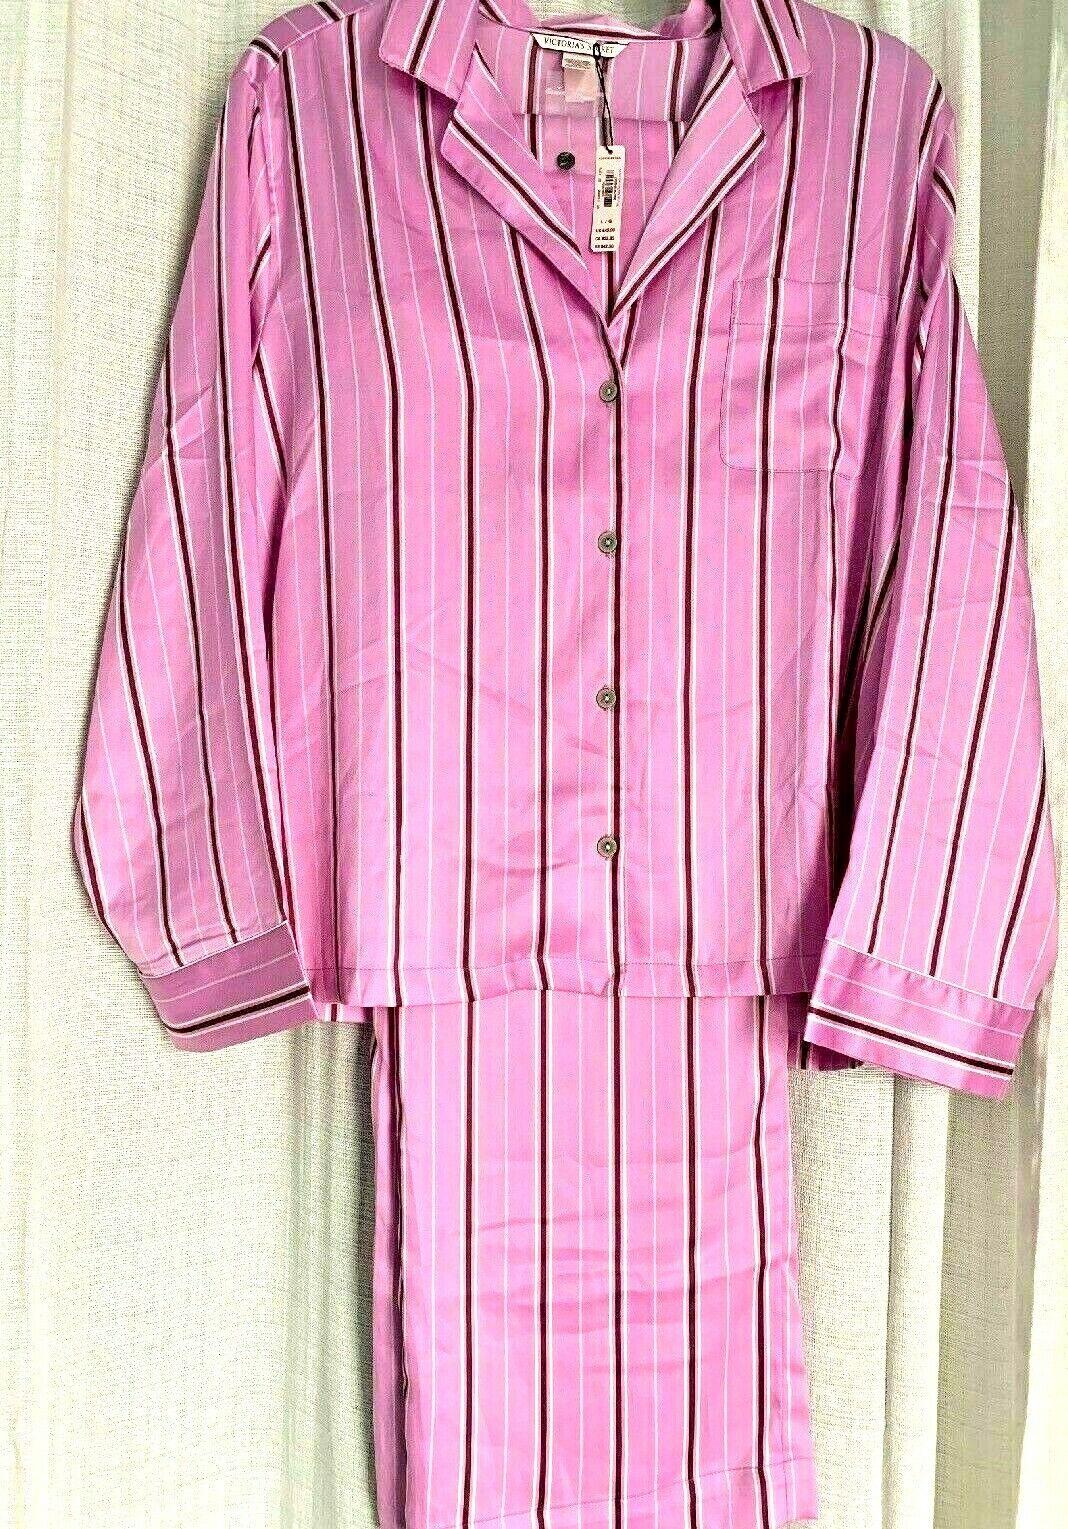 aee441420d NEW VICTORIA SECRET Satin SET Pajama pants stripe XS M L Gift peach pink PJ  ntxvxj6447-Sleepwear   Robes